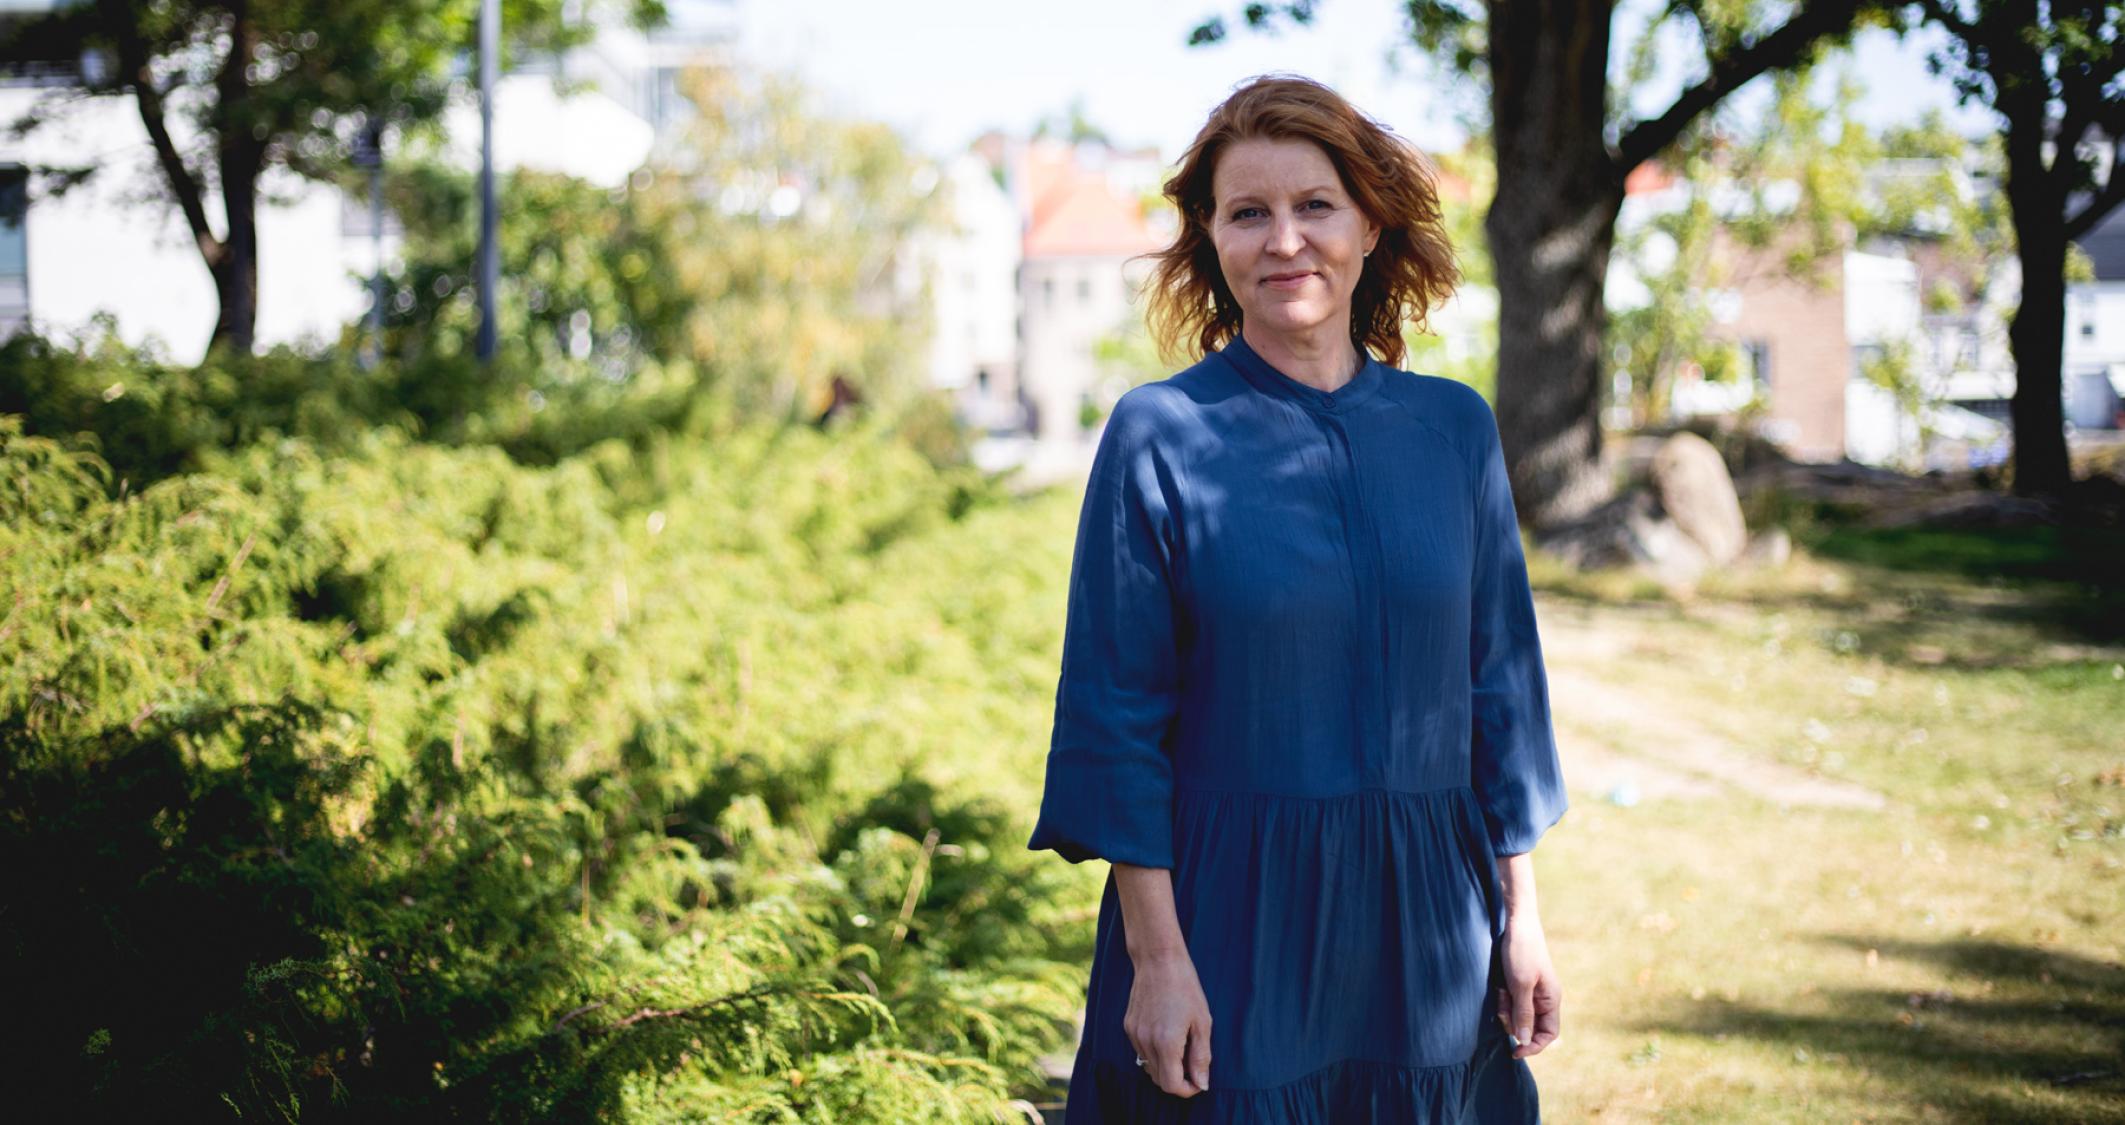 FOrskerportrett: I forbindelse med webinarserien FOrskerfrokost har vi intervjuet Høgskolelektor Marina Snipsøyr Sletten, som presenterer sin forskning på FOs arrangement tirsdag 7. september.